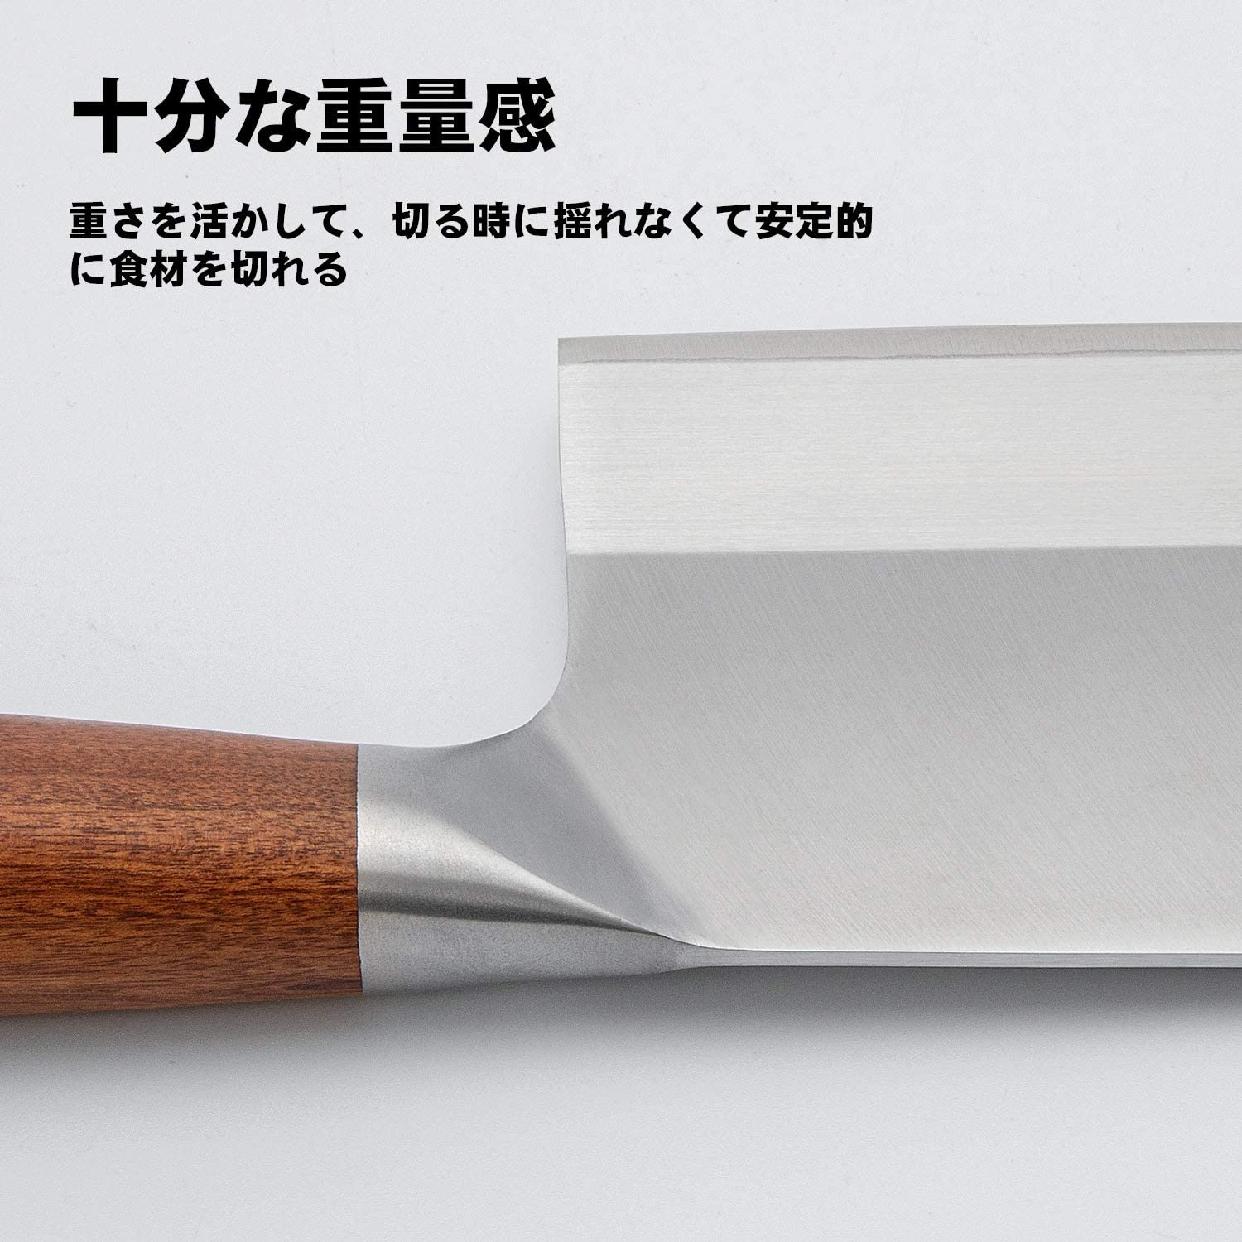 MUKAI(ムカイ) 中華包丁 29.5cmの商品画像7